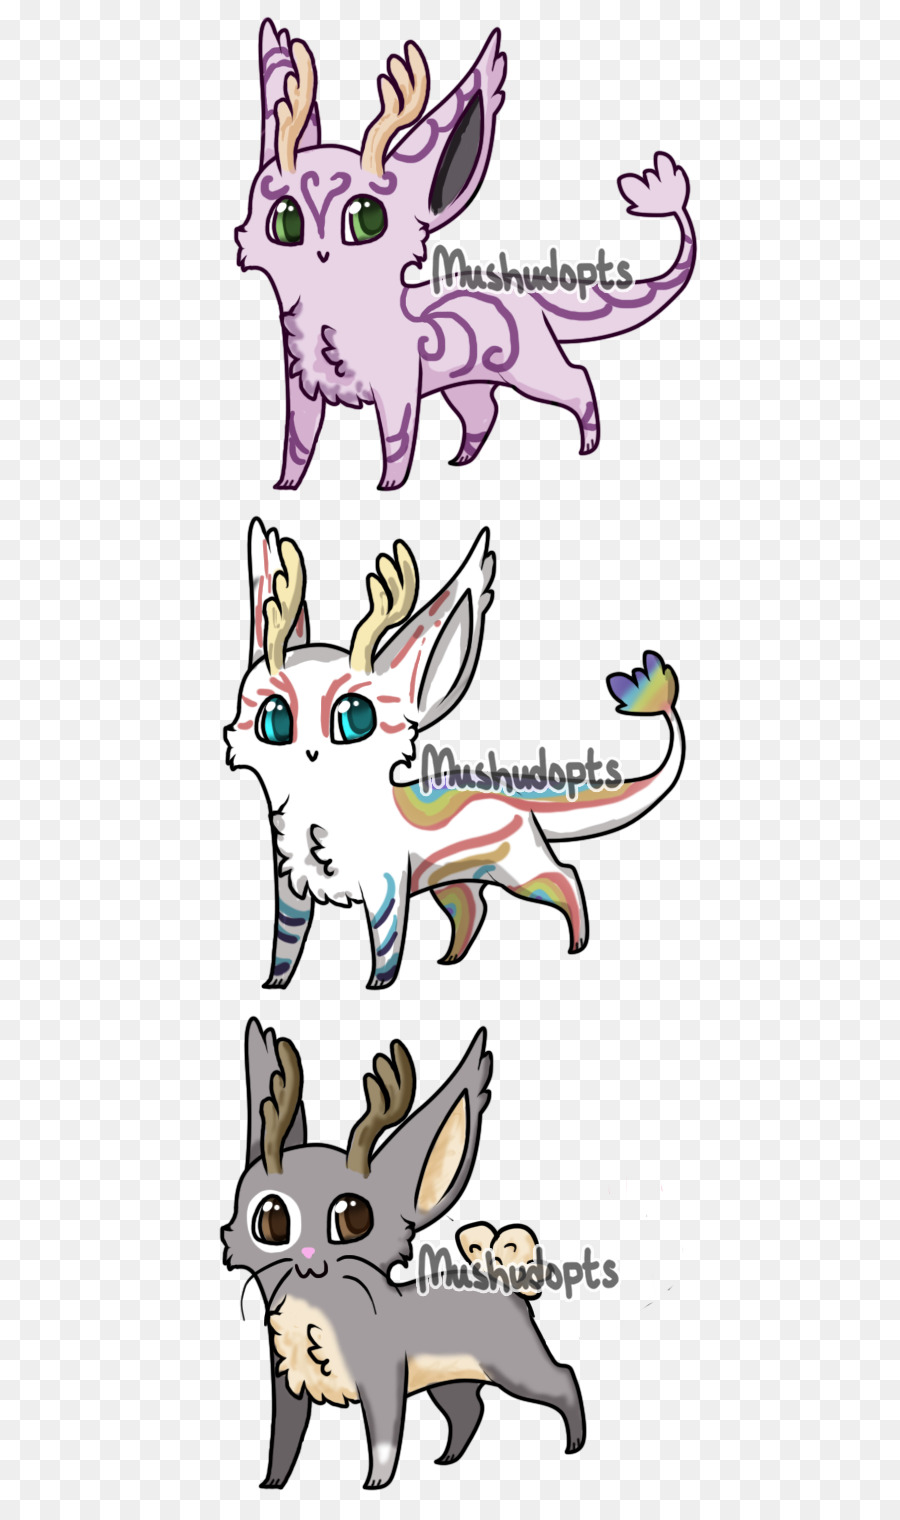 Kucing Kartun Hewan Peliharaan Clip Art Kucing Unduh Kuda